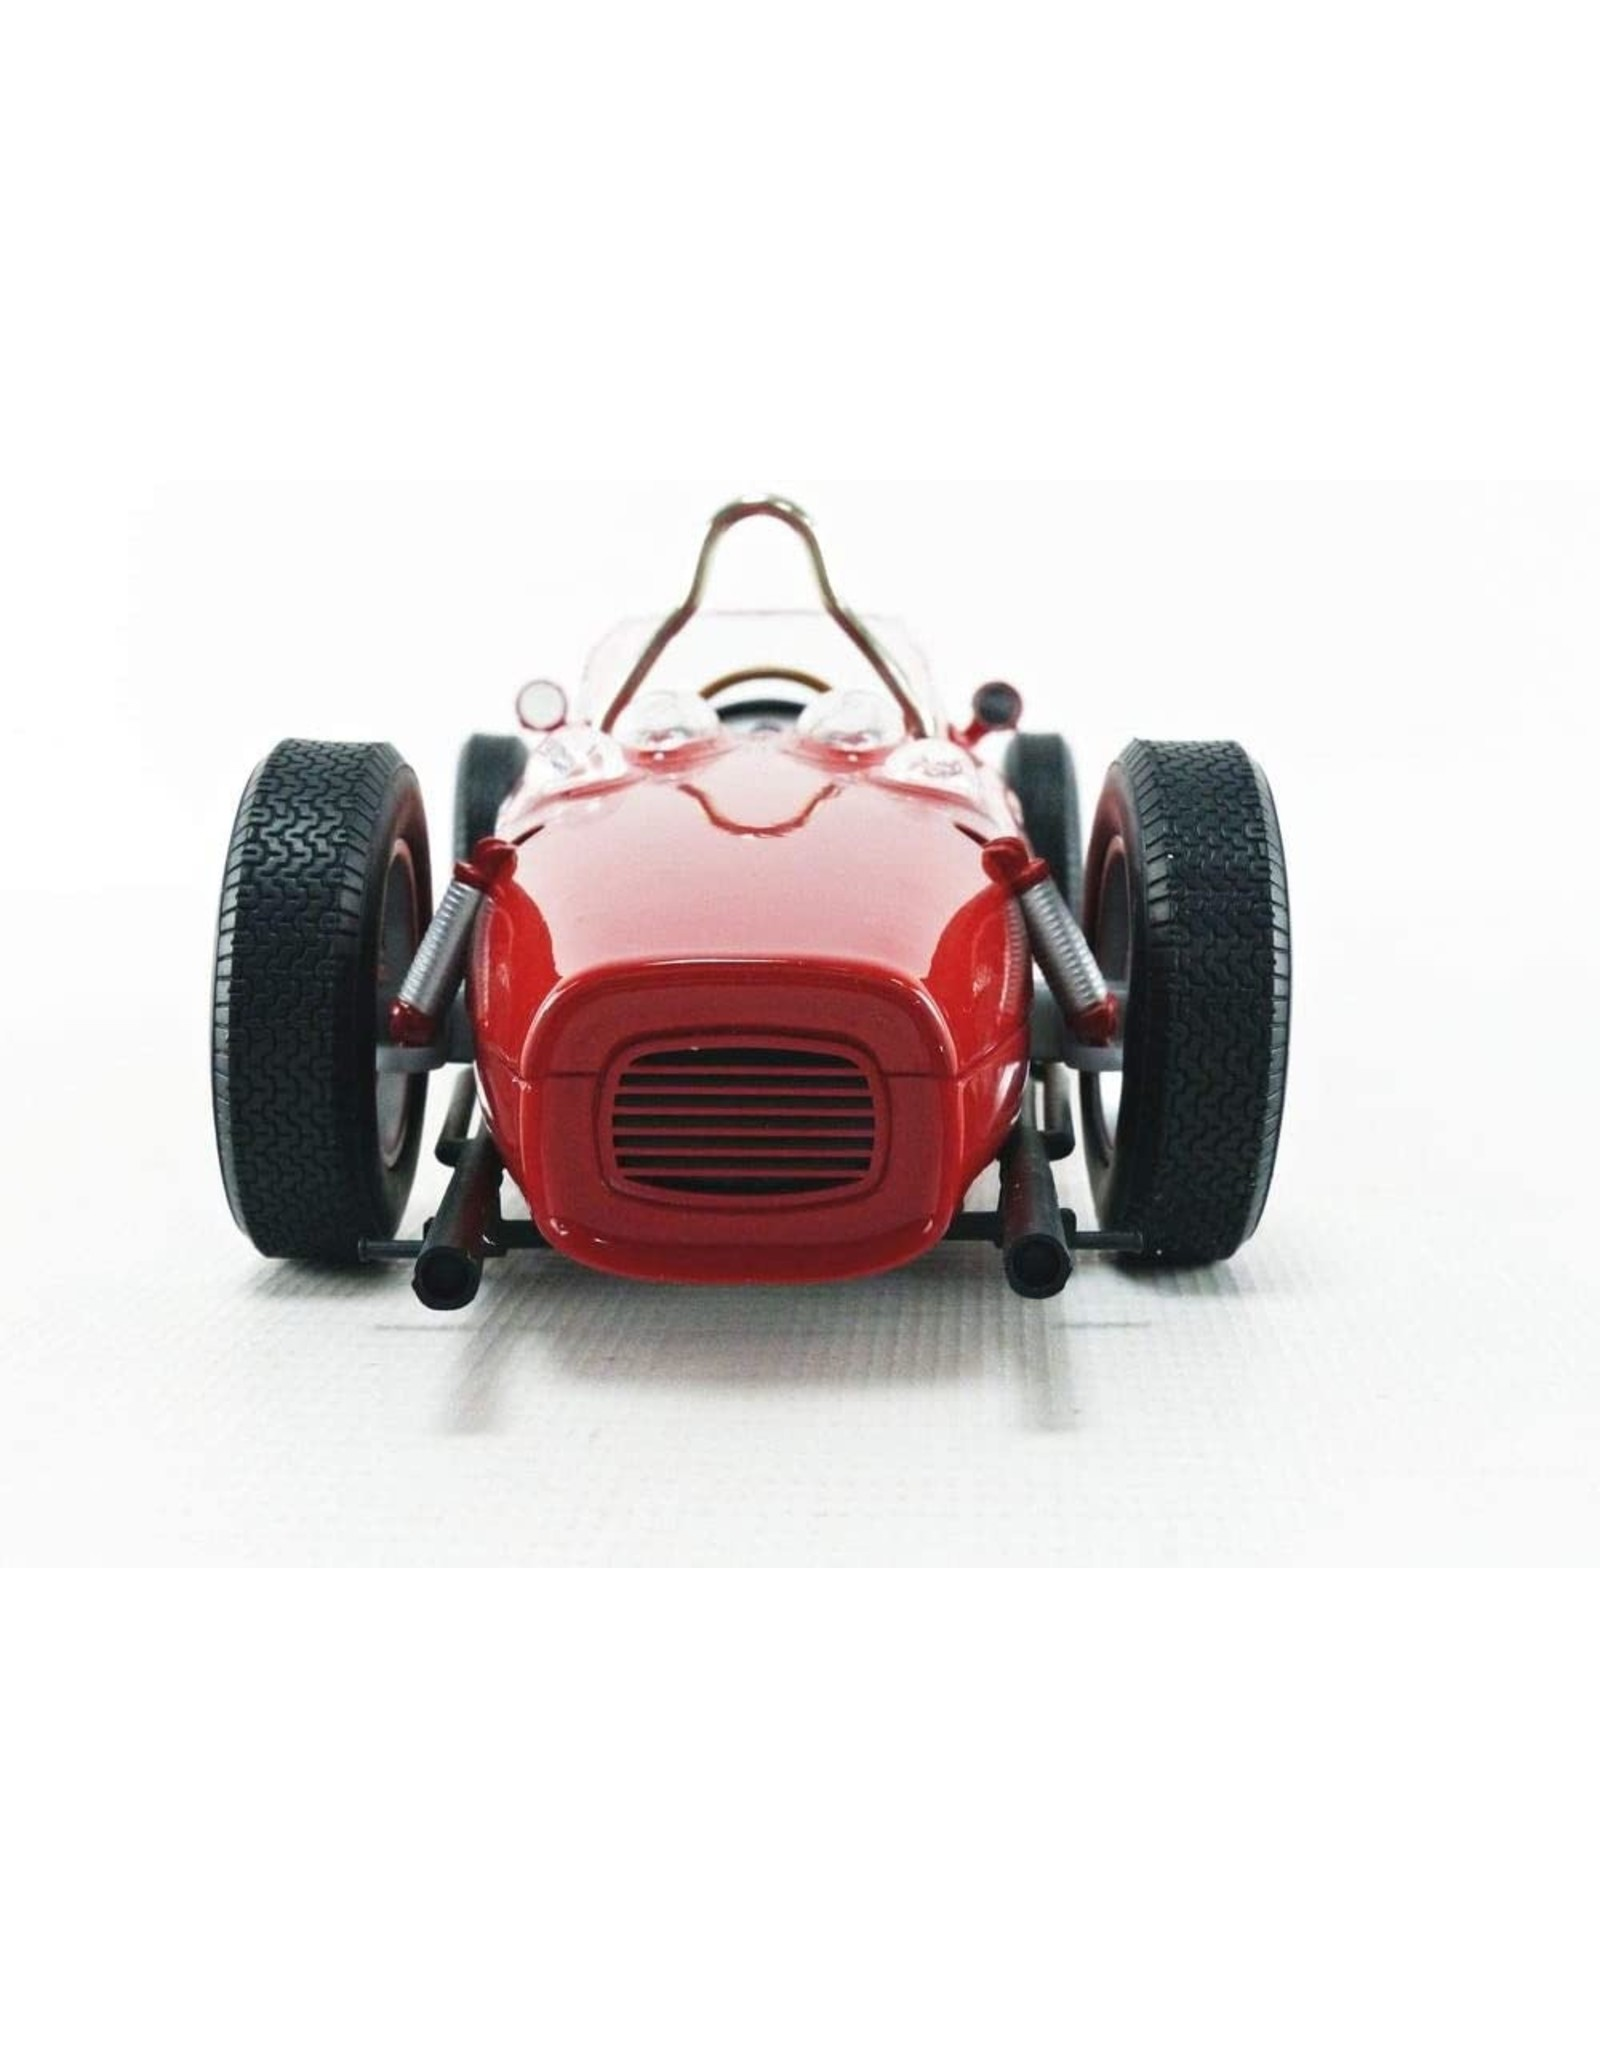 Formule 1 Ferrari Dino 156 Sharknose (Plain Body Edition) 1961 - 1:18 - CMR Classic Model Replicars